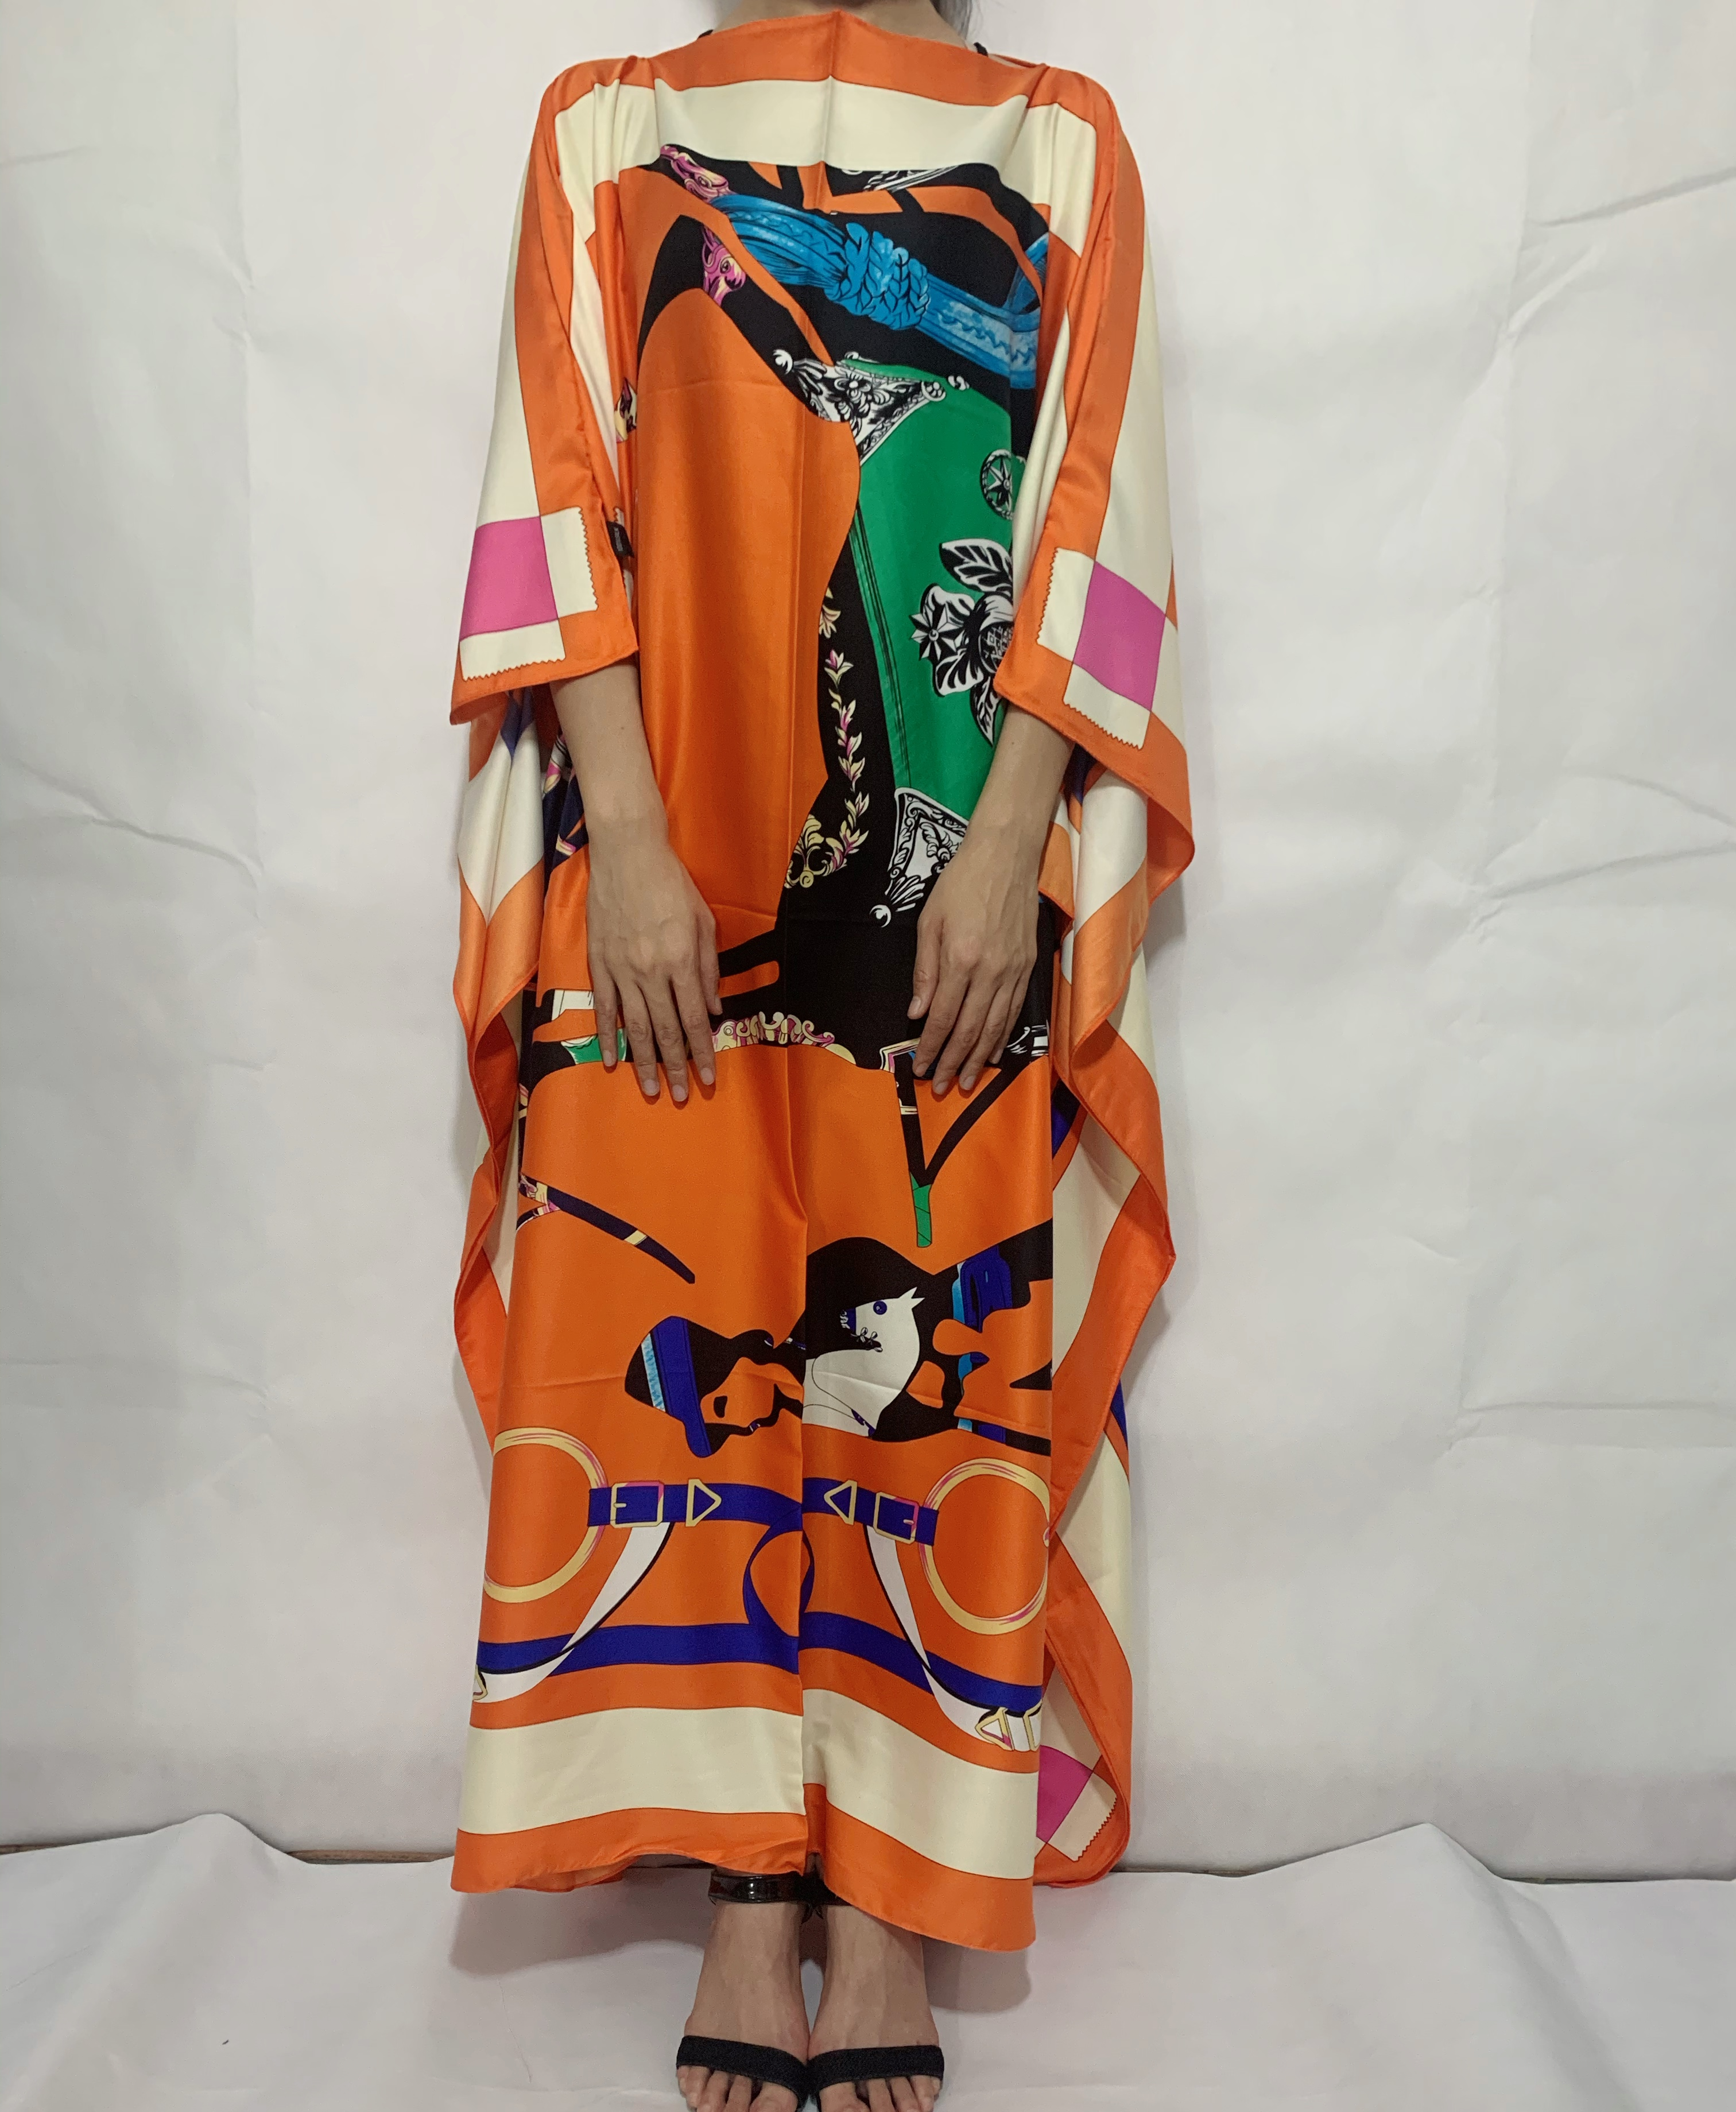 européenne vêtements 2020 Floral Printed Silk Kaftan boho Dress Fashion Batwing Sleeve Sundress women beach long dress for party